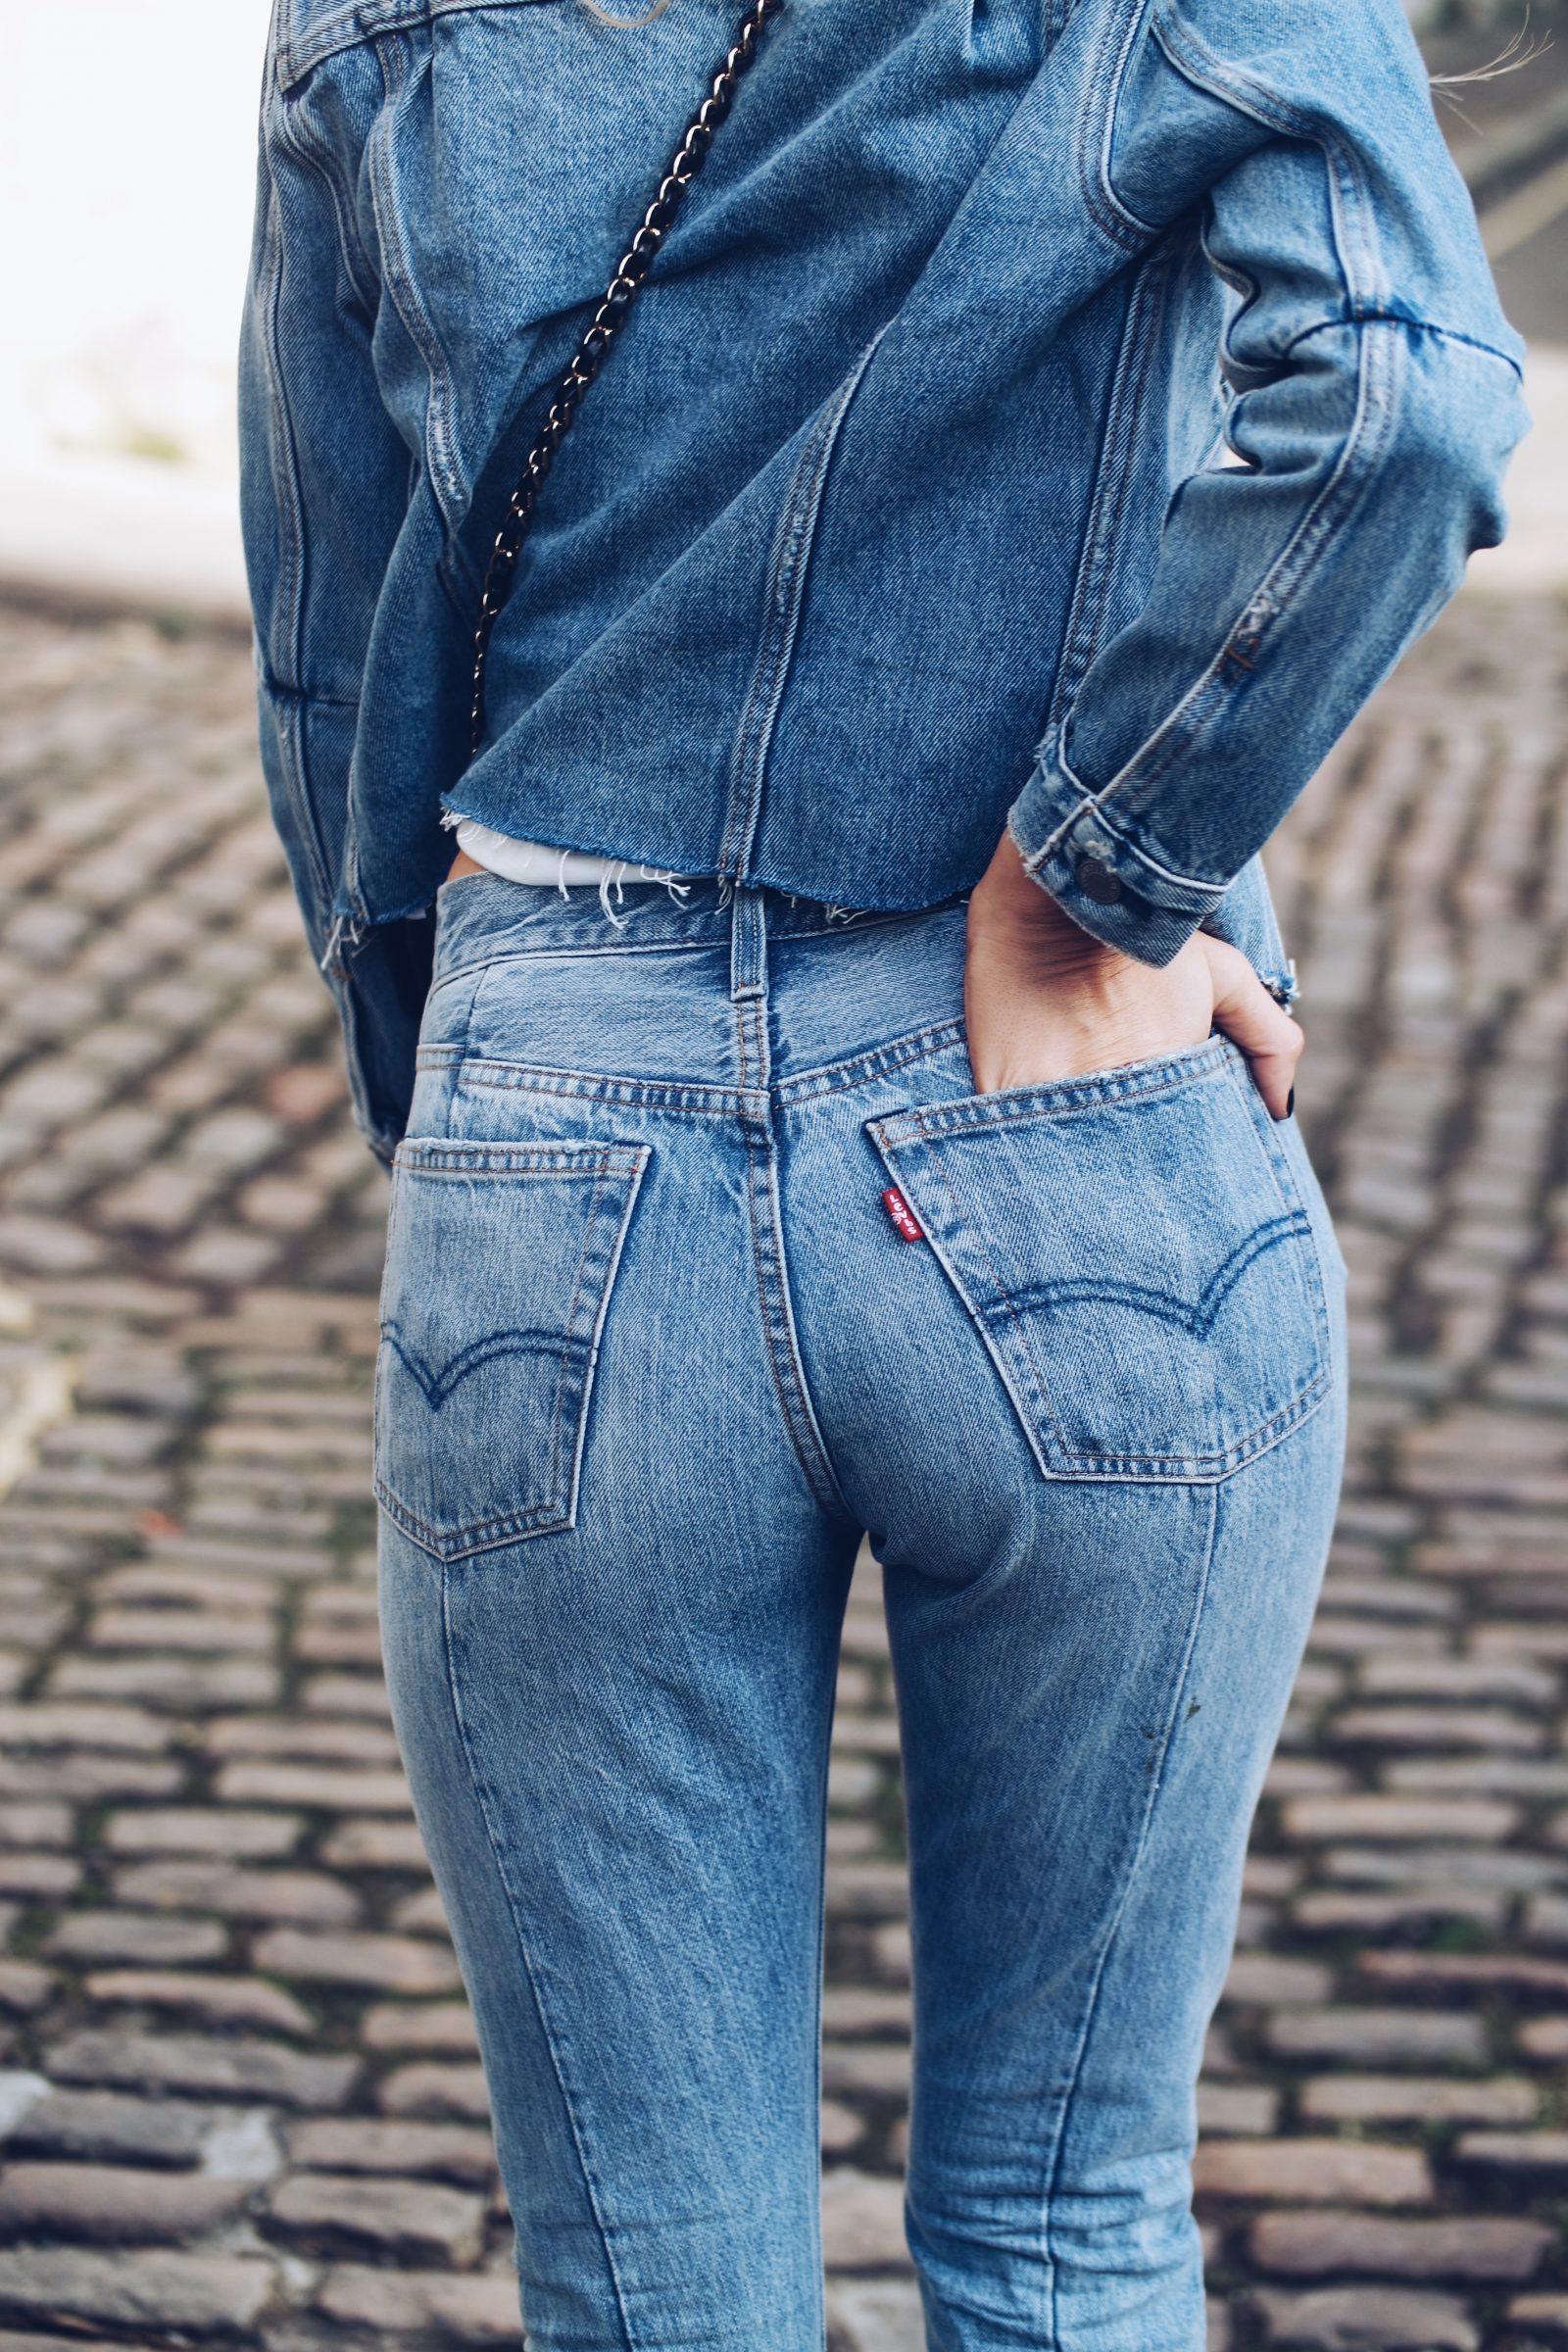 Levis Denim - Altered Jeans